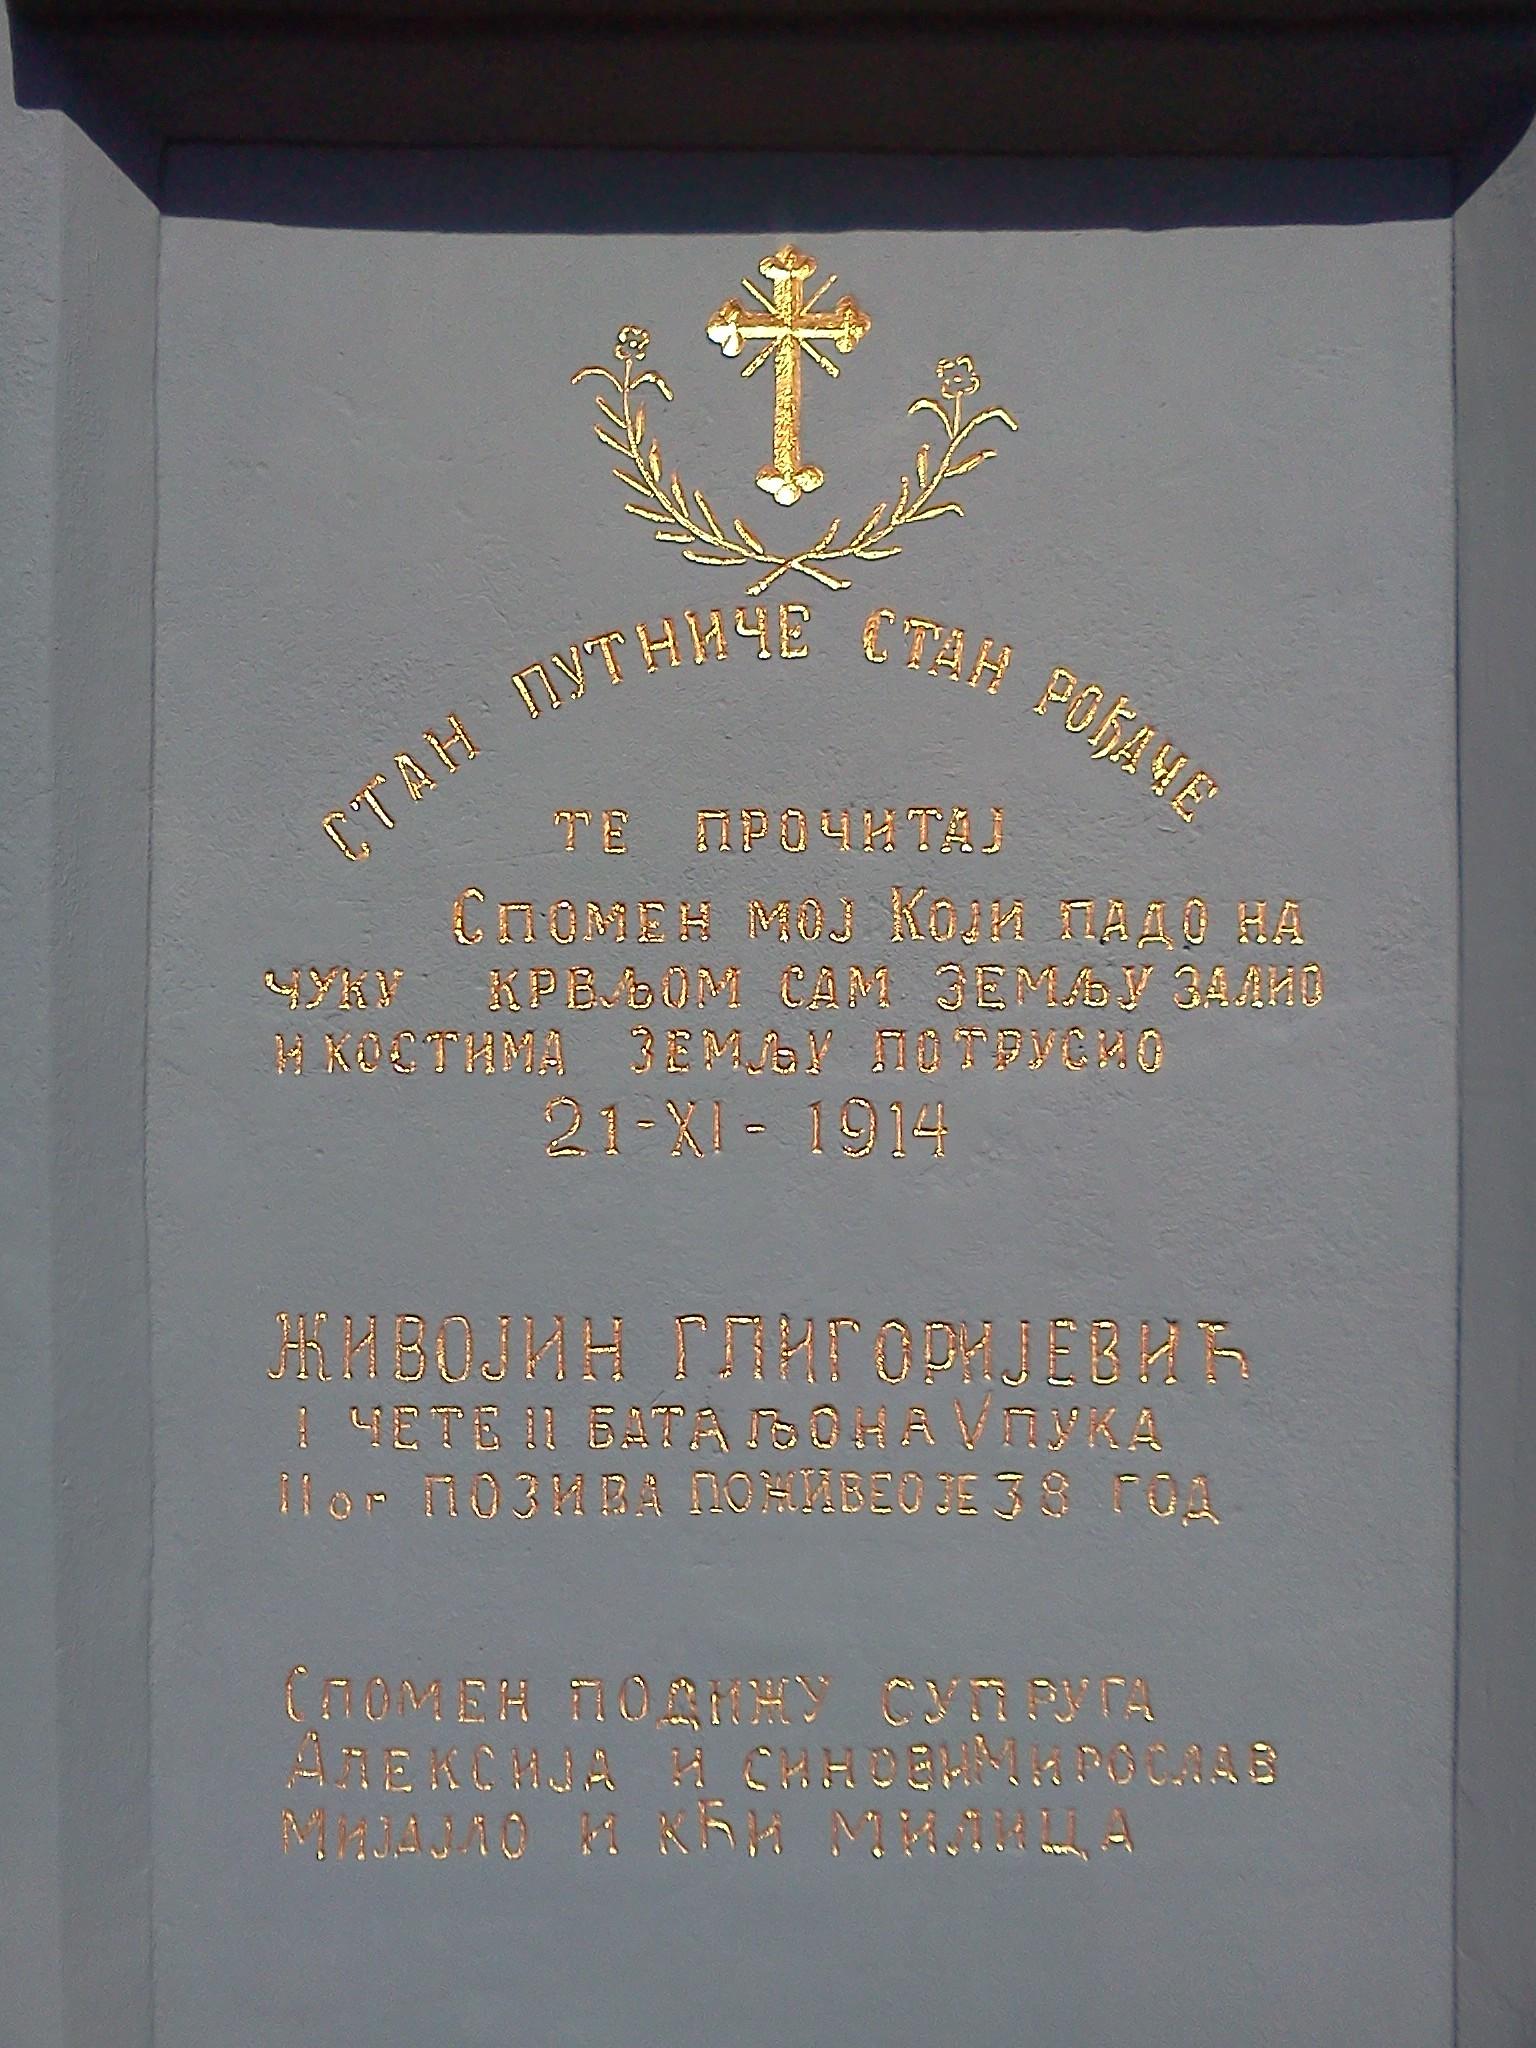 Tekst na spomeniku krajputašu